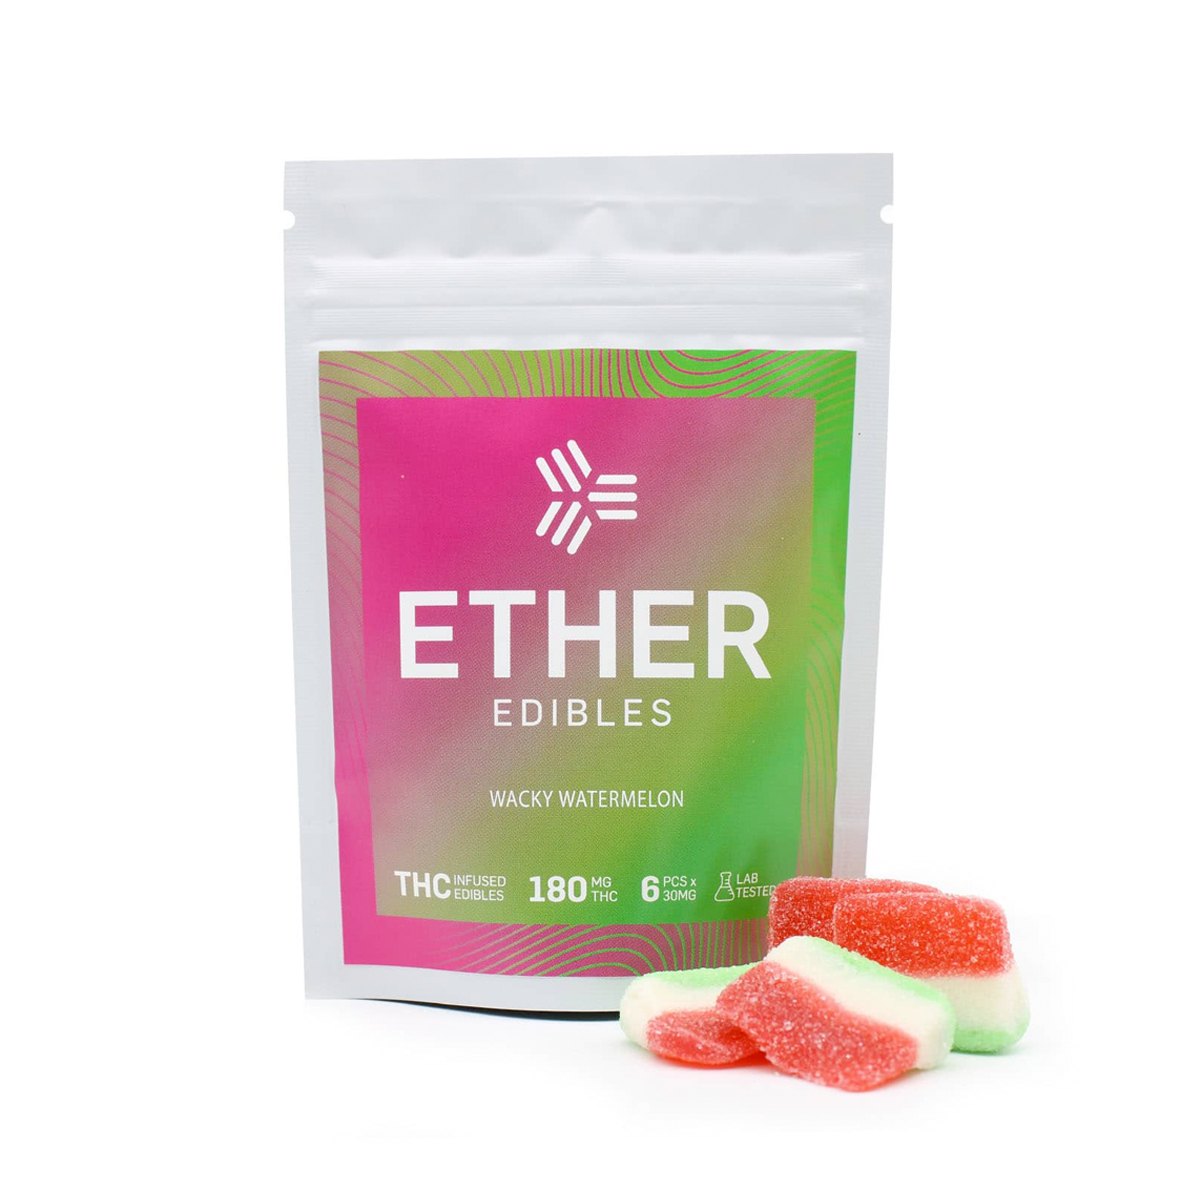 Buy Ether Edibles Wacky Watermelon - 180mg